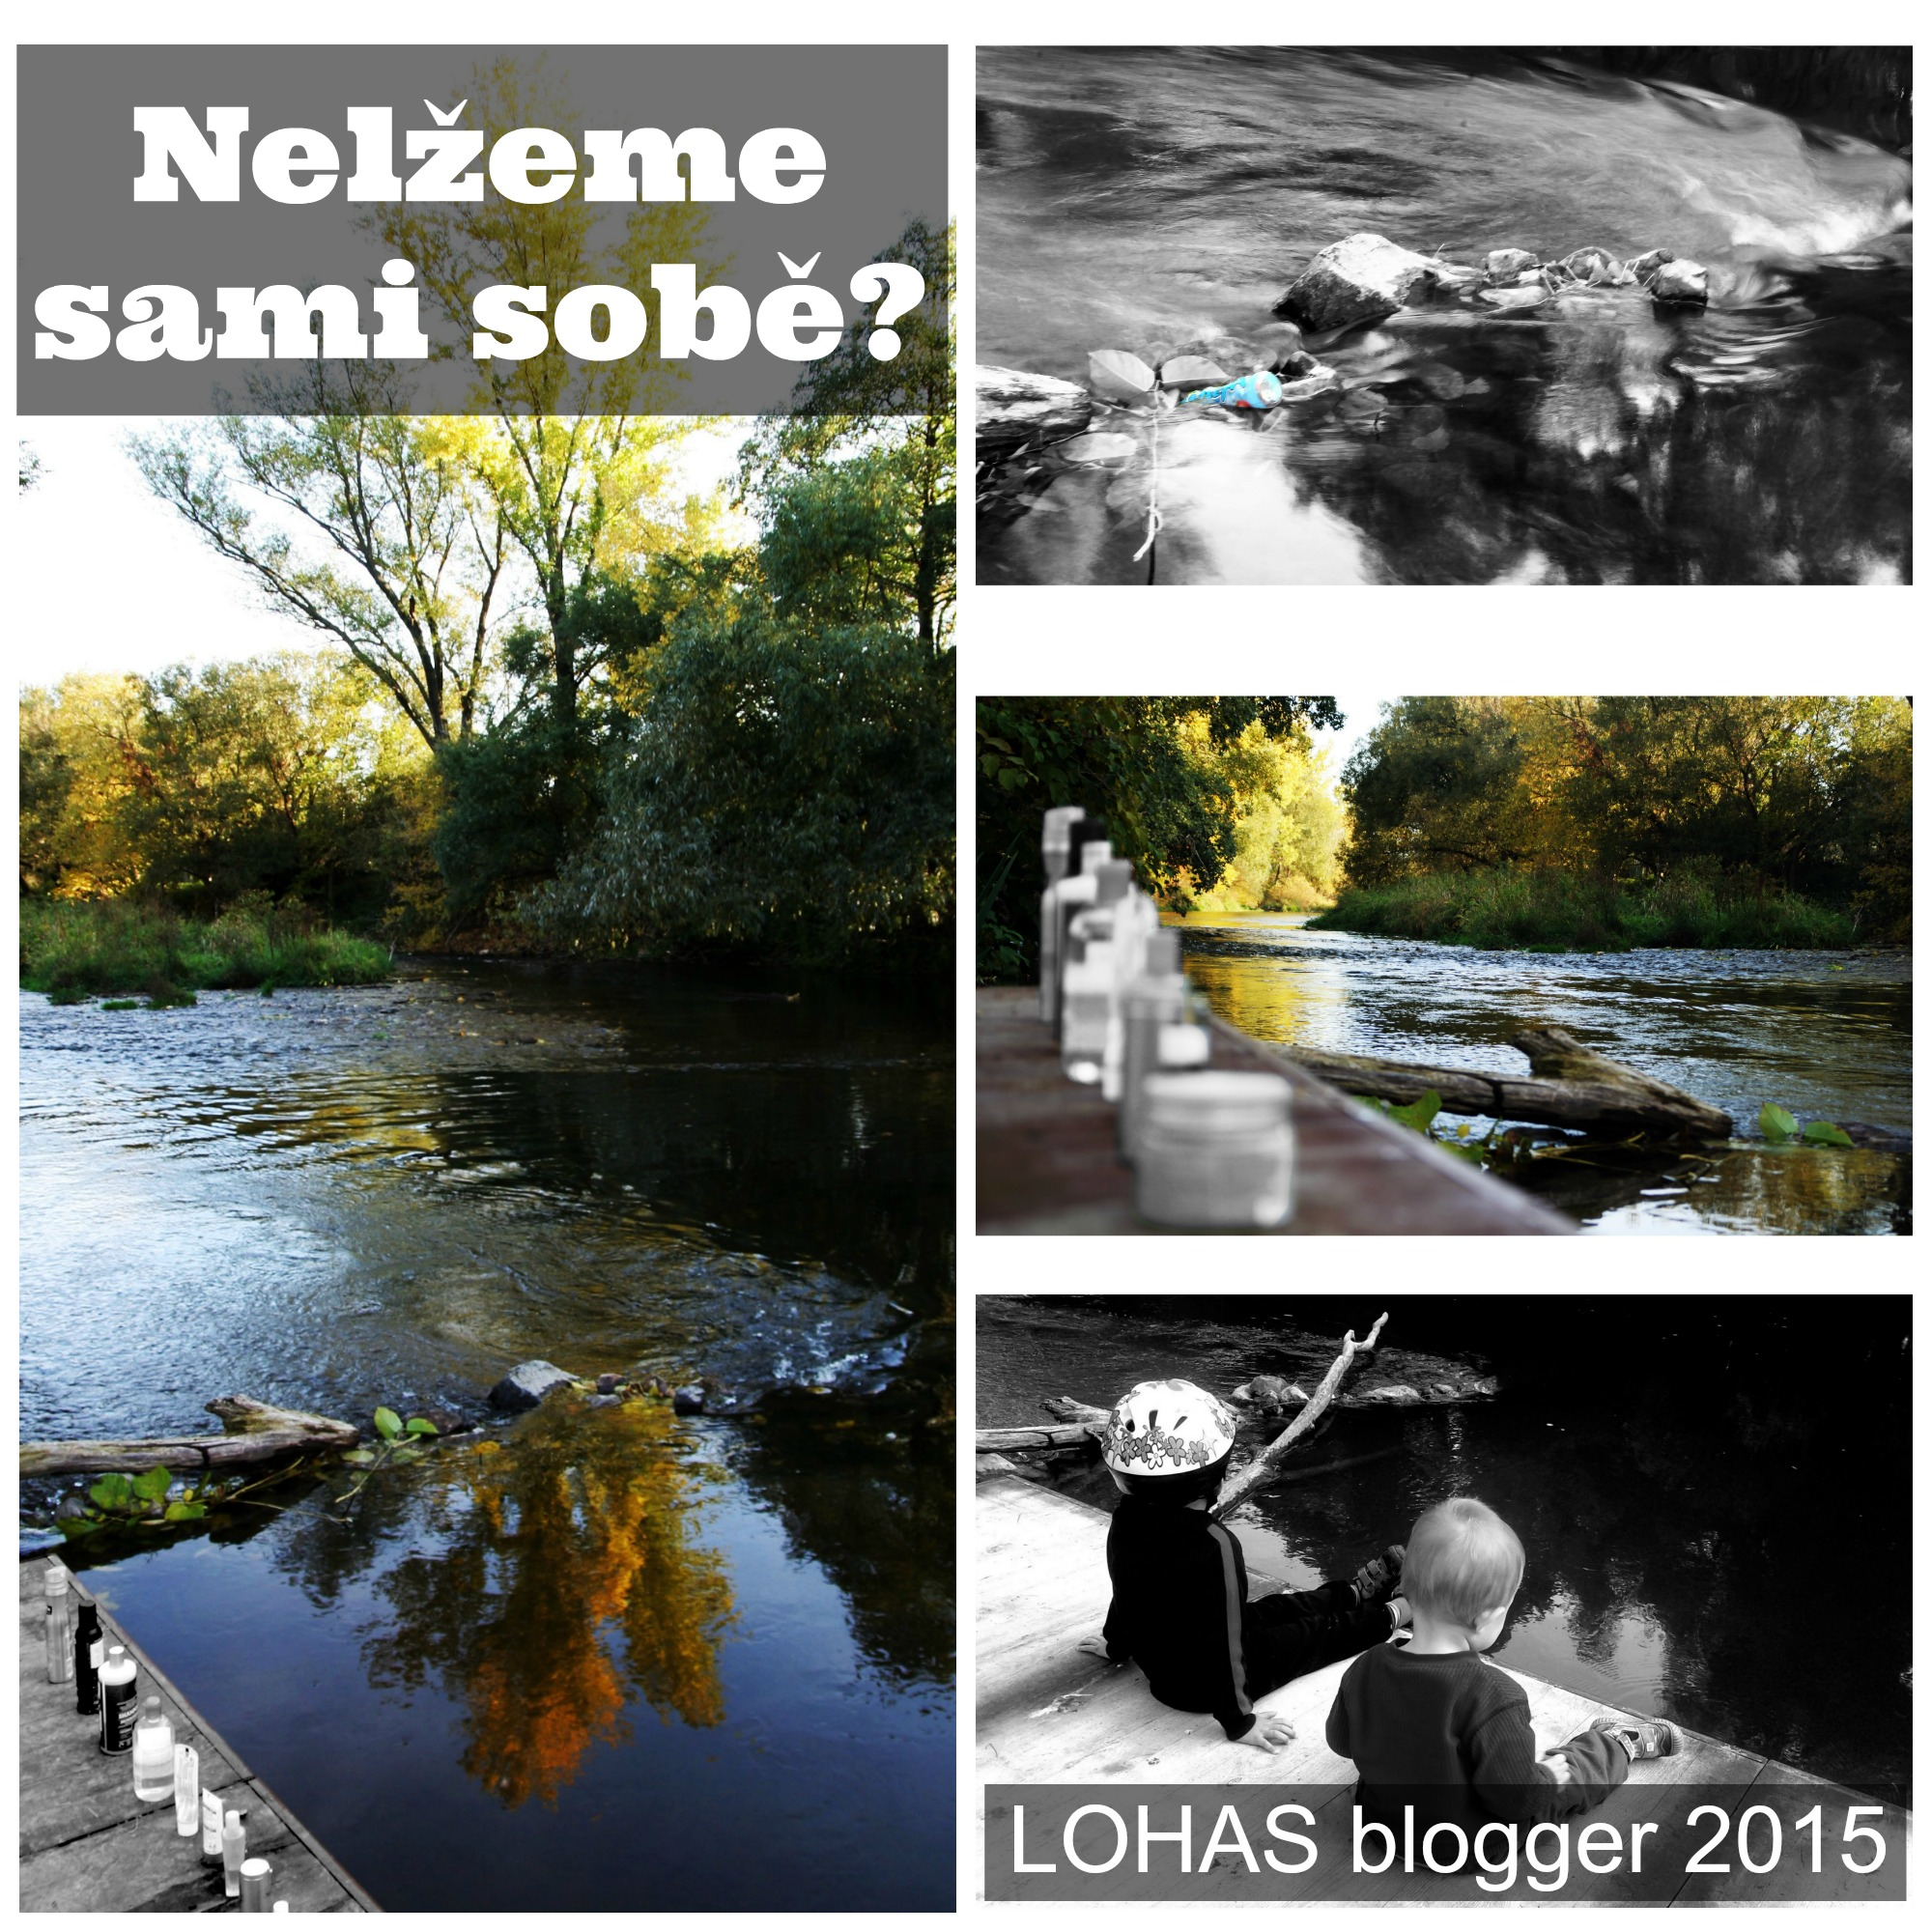 LOHAS blogger 2015